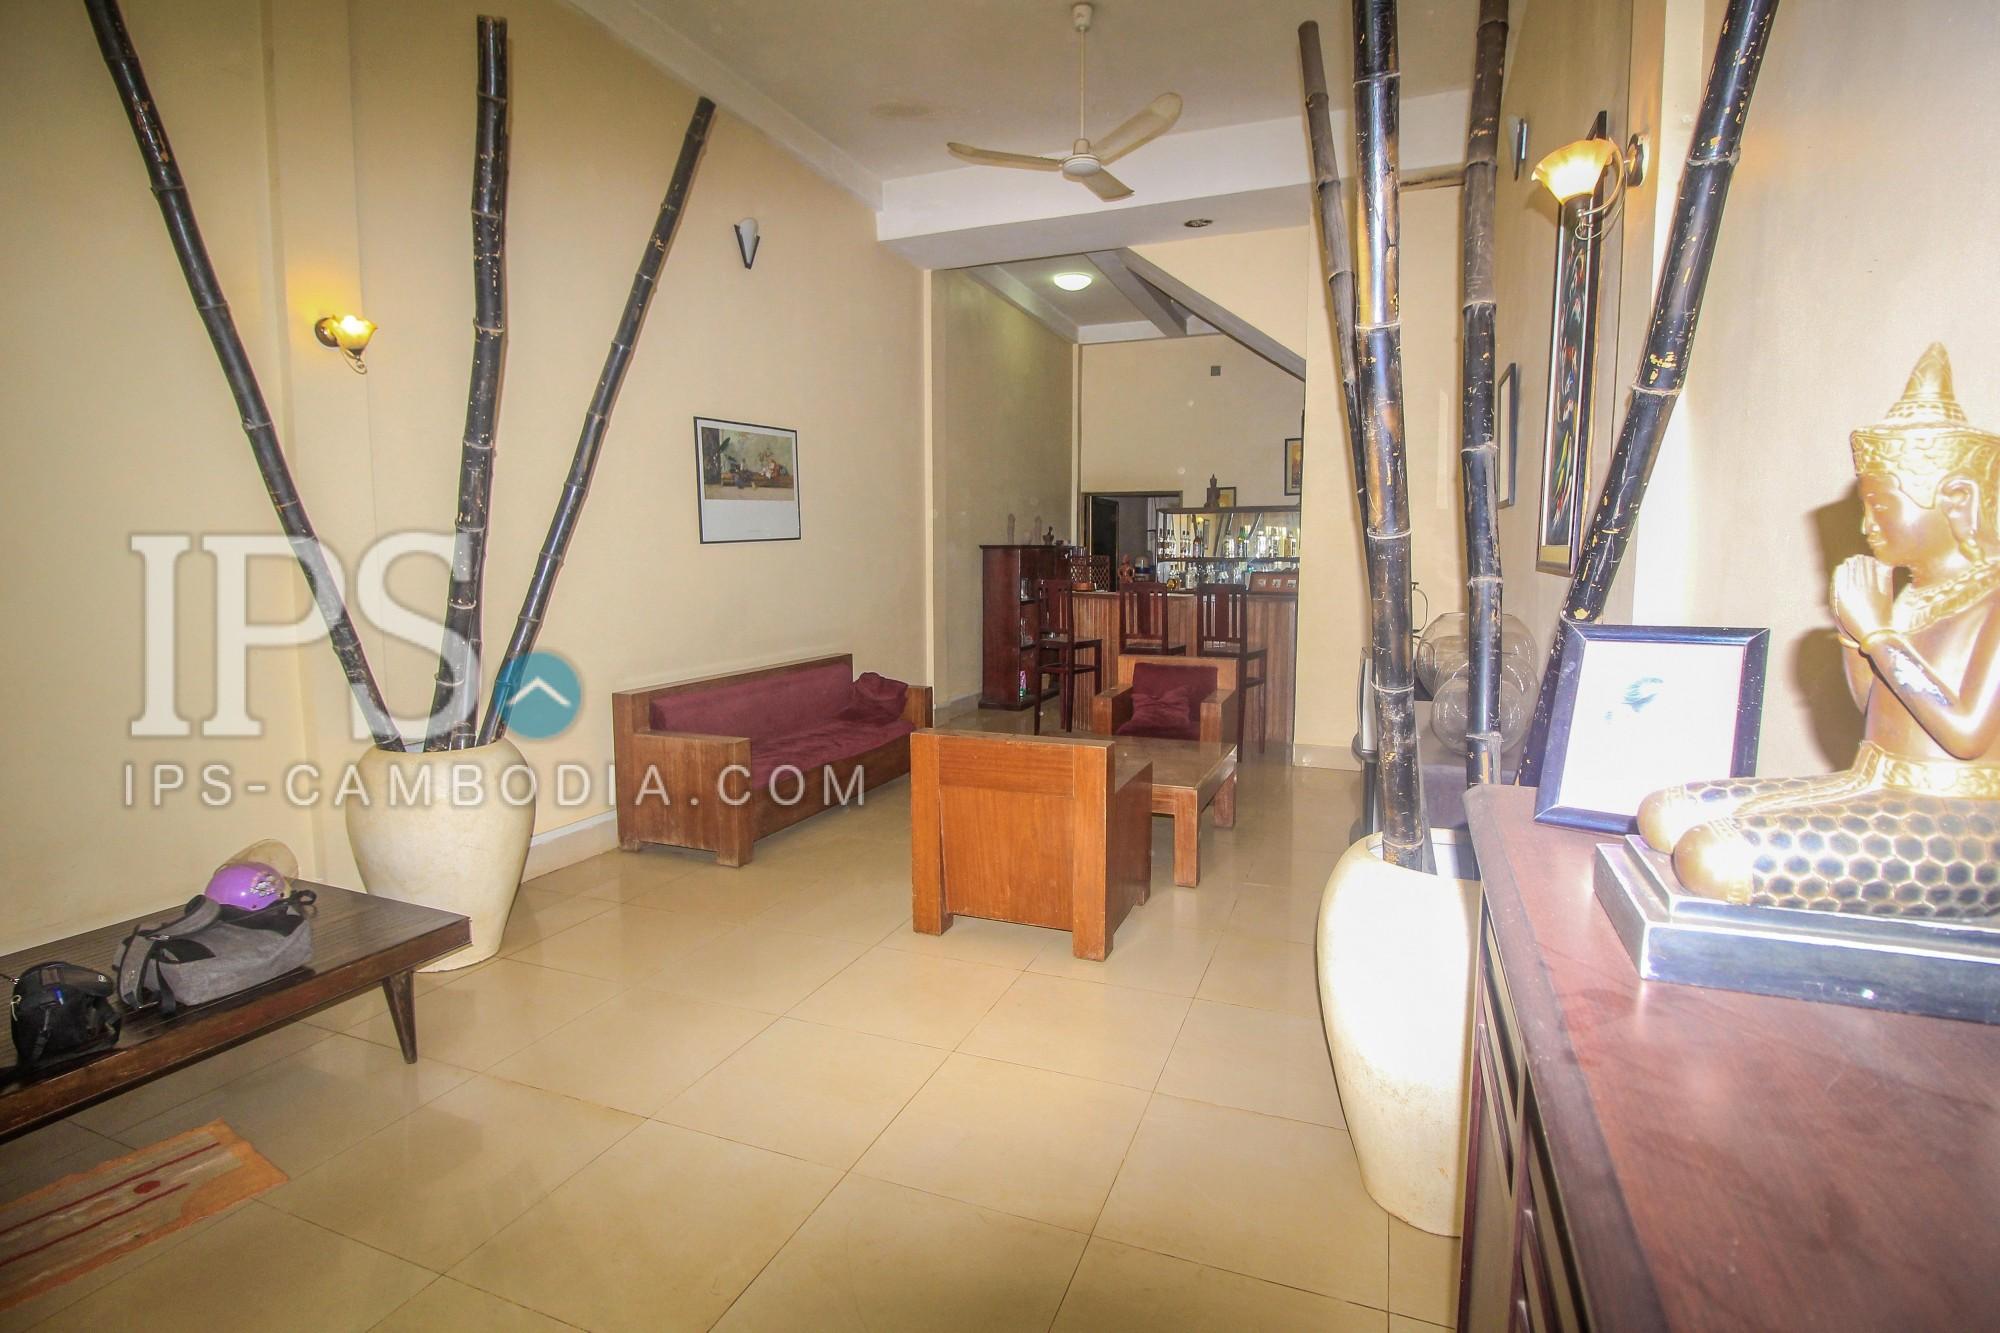 4 Bedroom Flat for Sale - Siem Reap